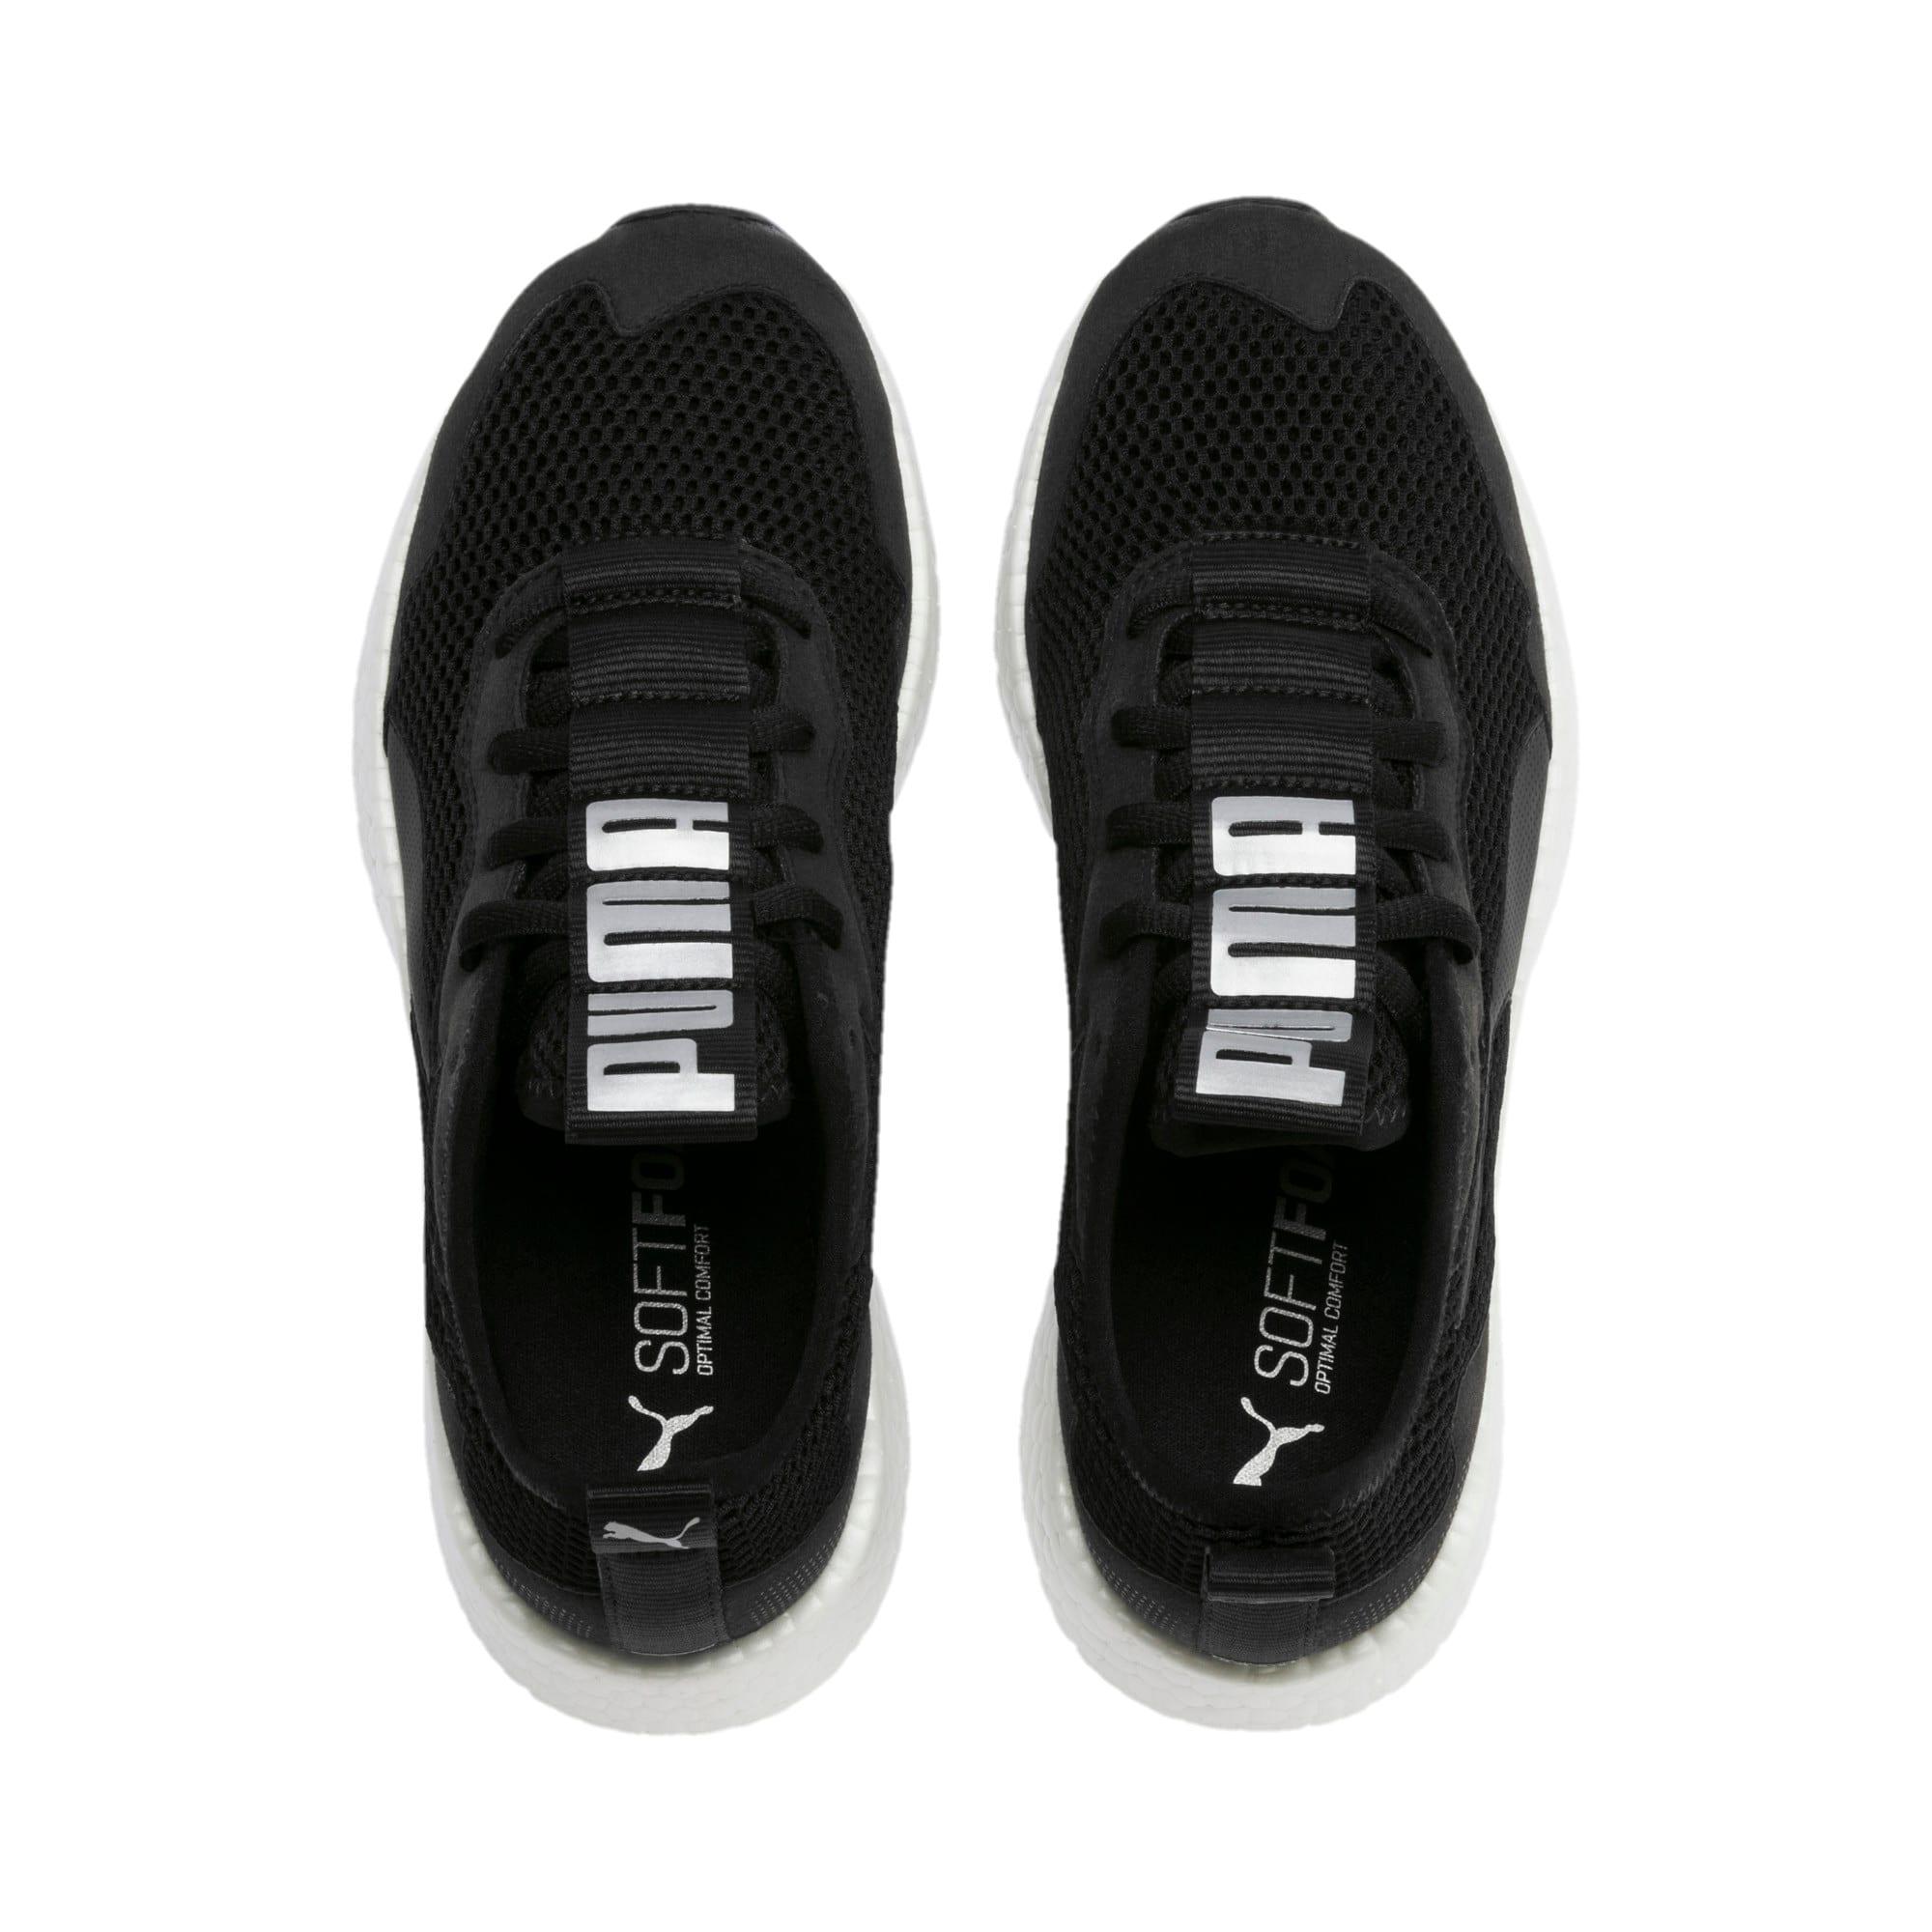 Thumbnail 7 van NRGY Neko Skim hardloopschoenen voor vrouwen, Puma Black-Puma Silver, medium